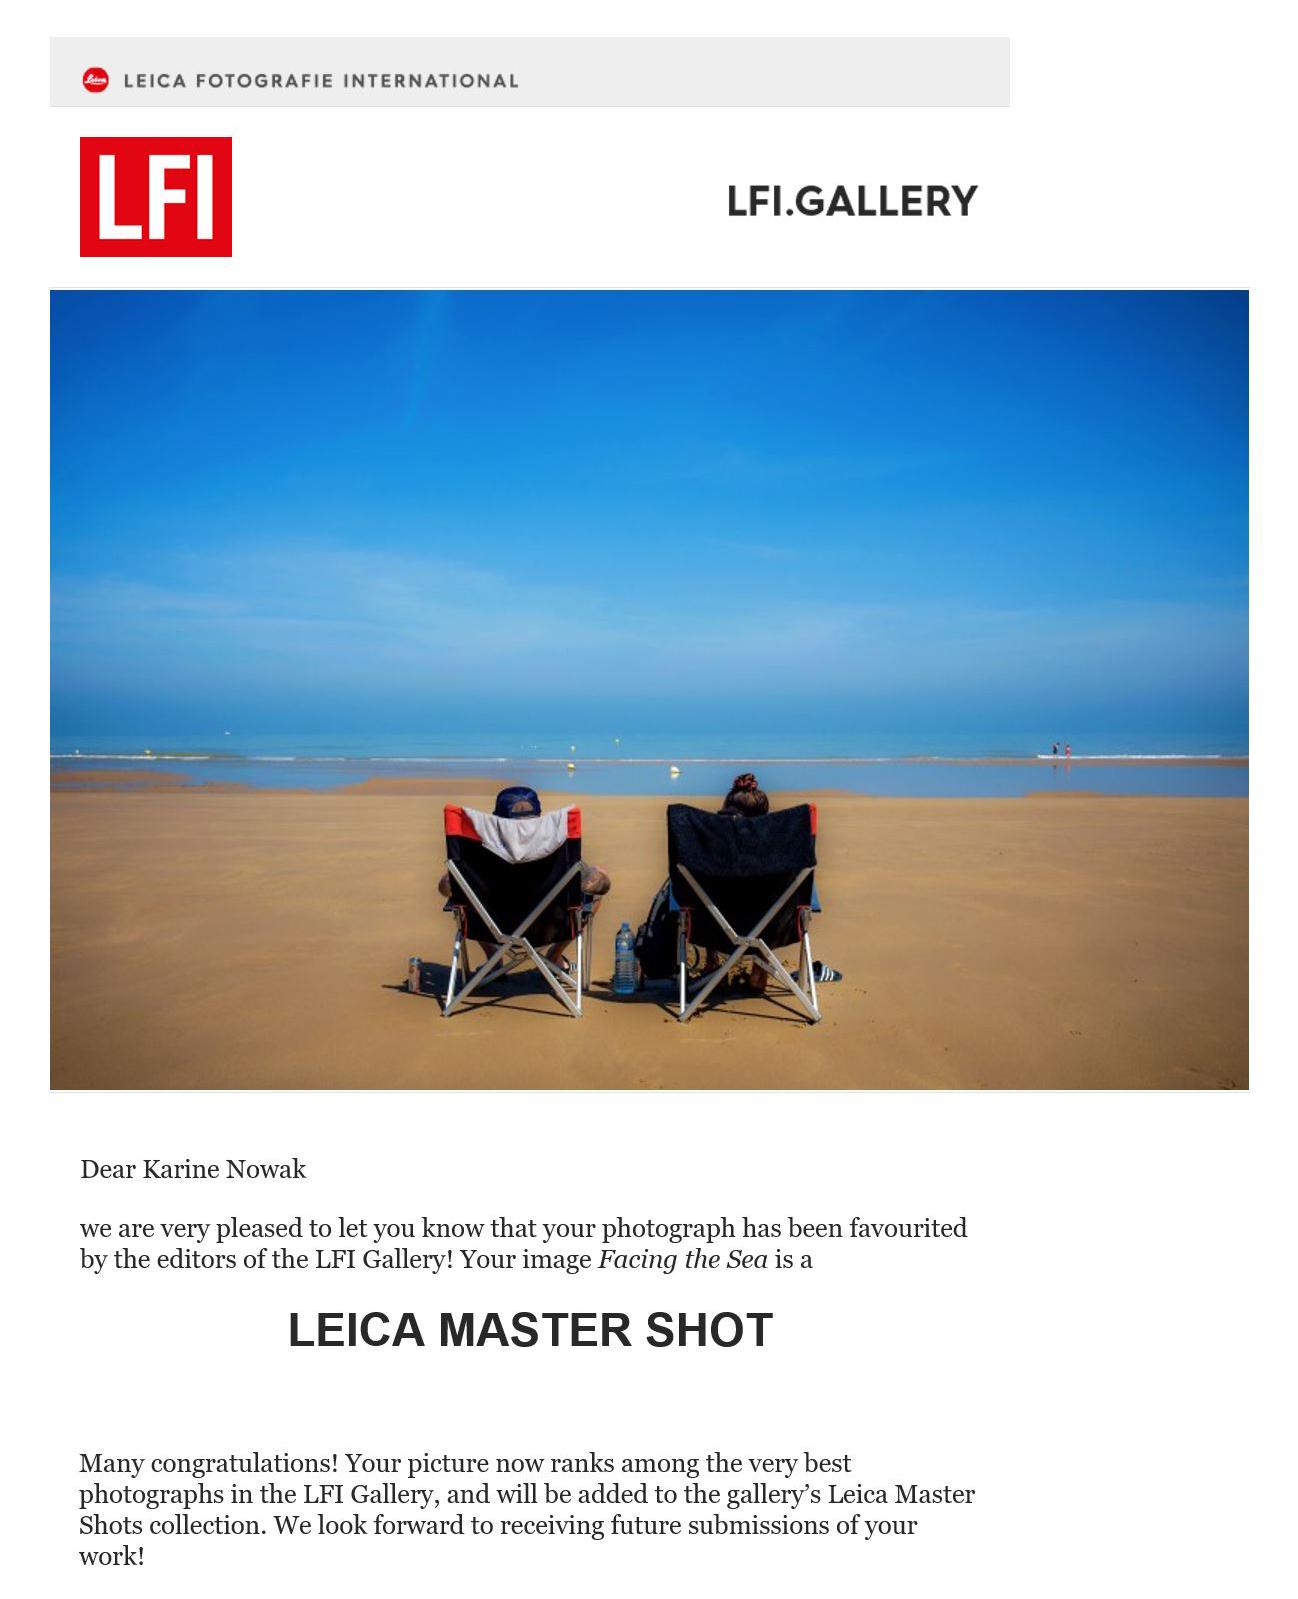 Leica Fotografie International - Karine Nowak